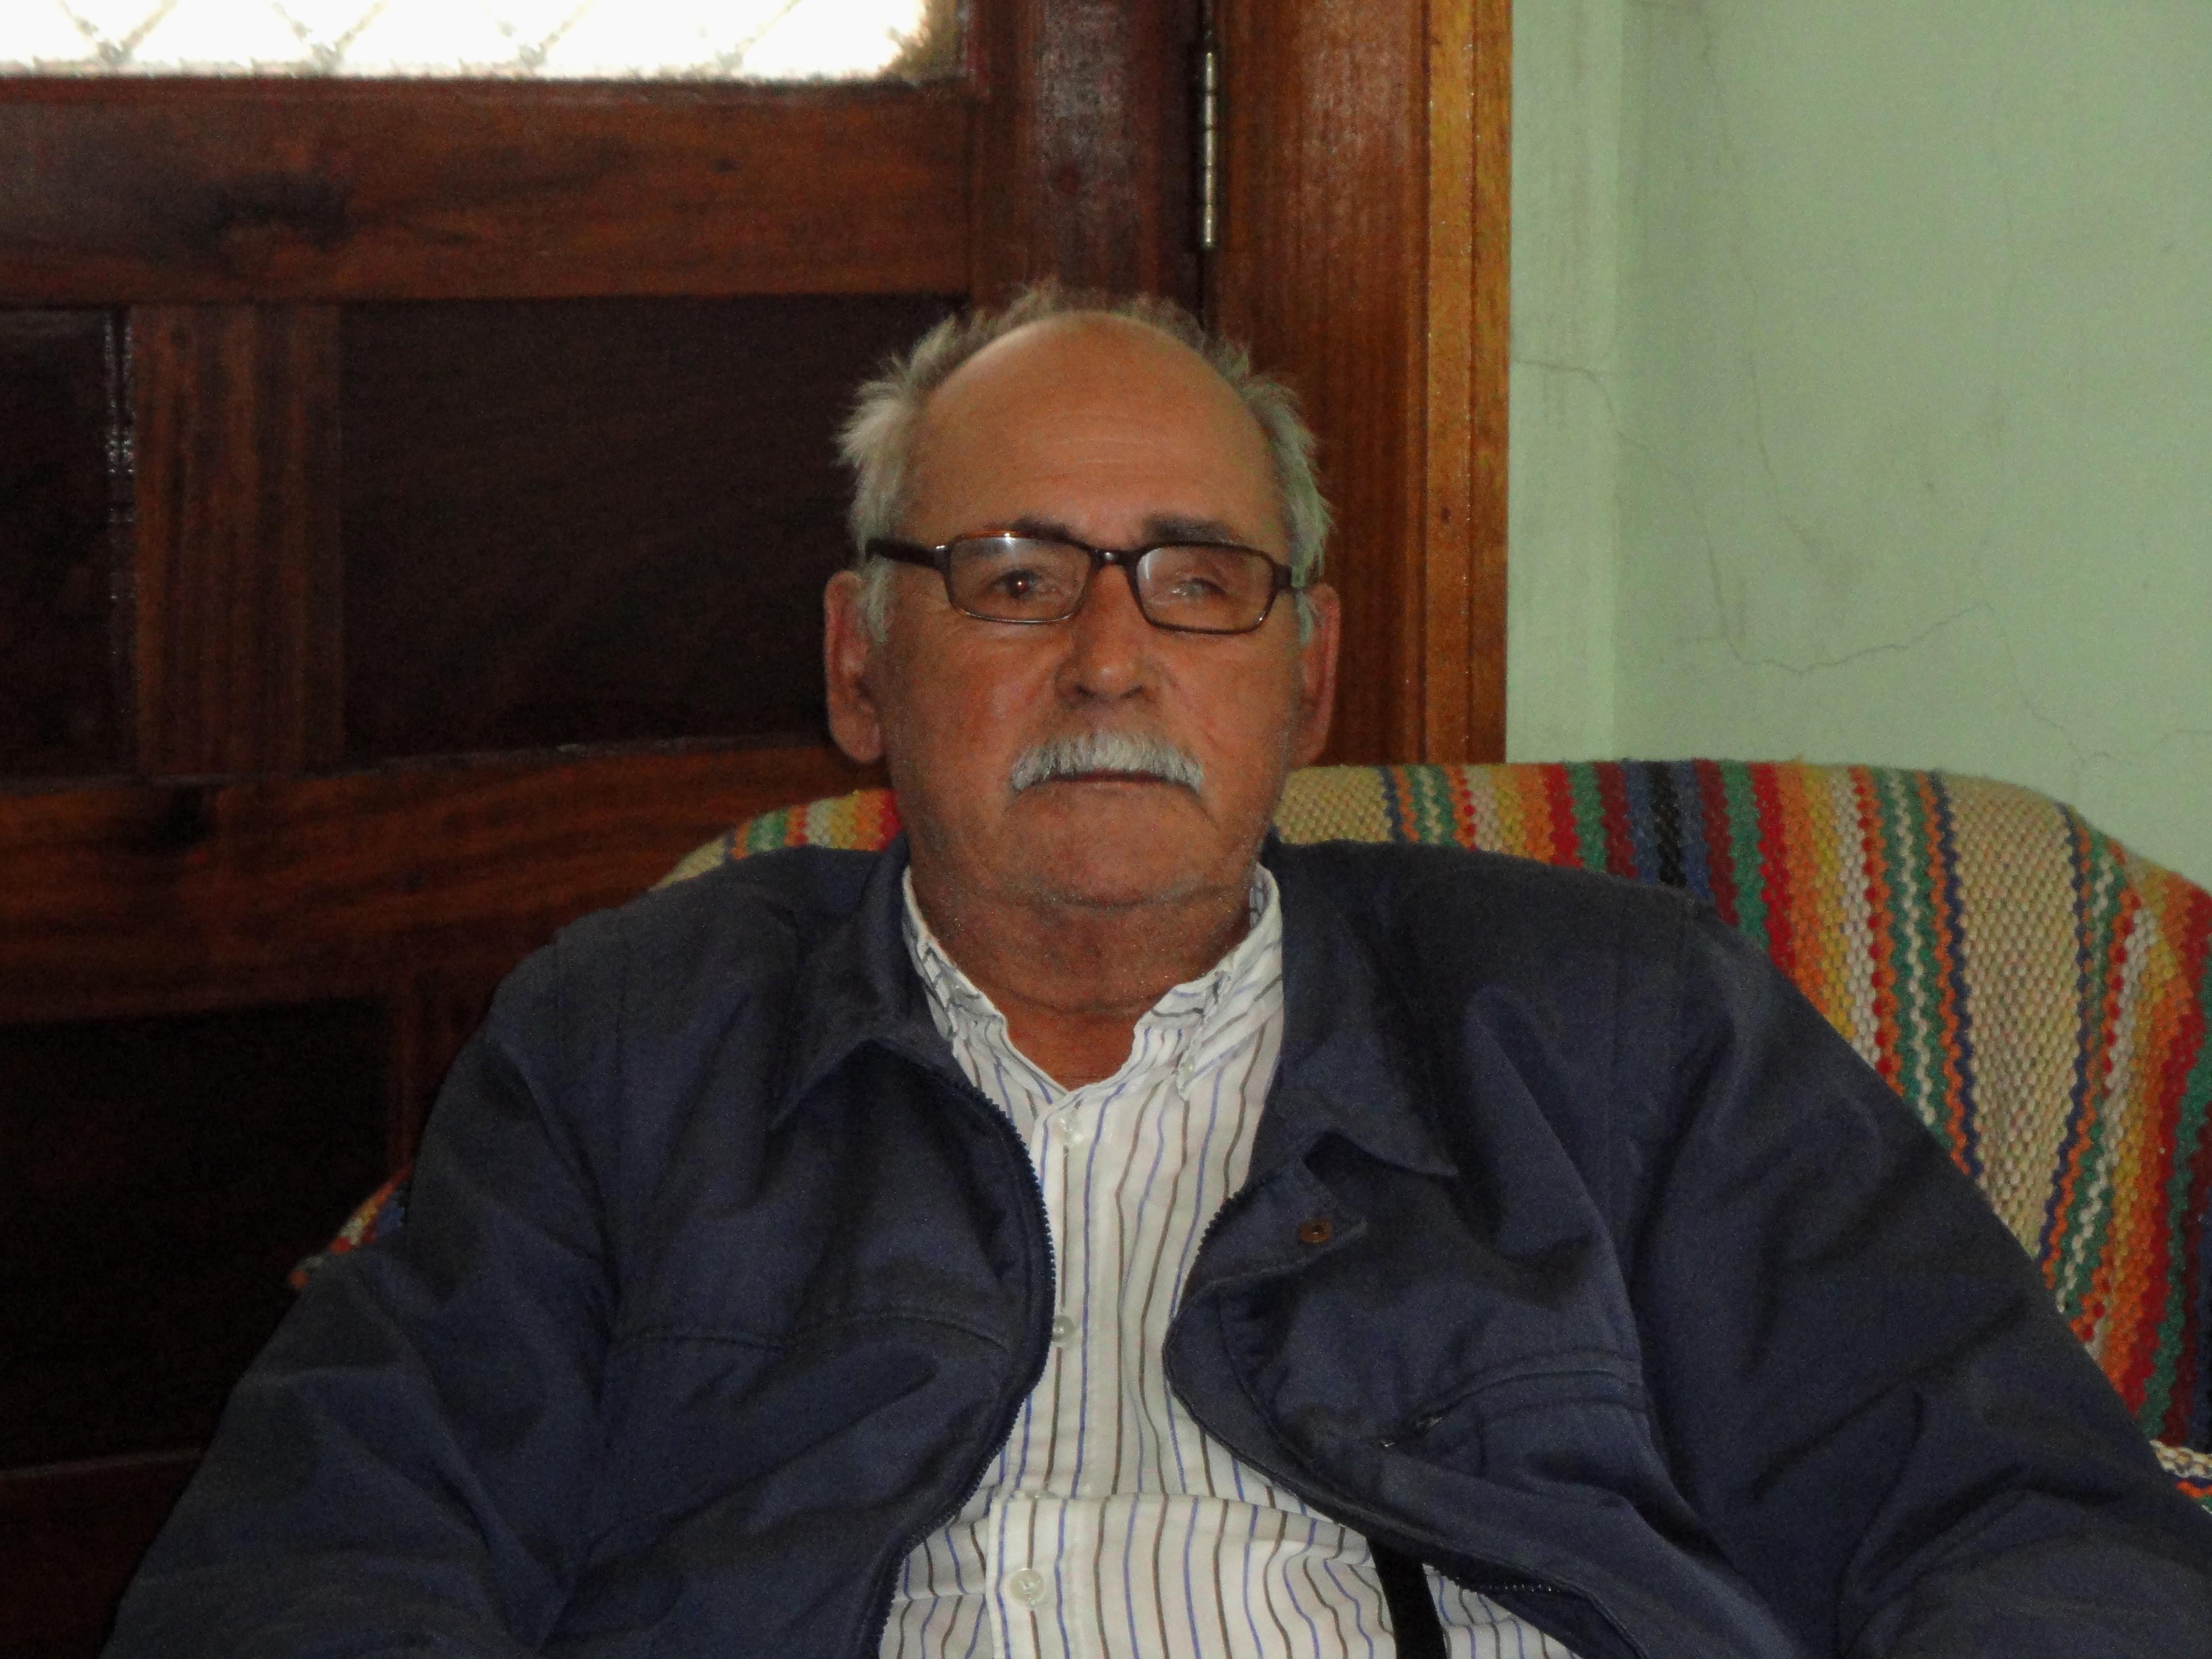 Valdemar Alves da Silva, cantador ao desafio com 50 anos de carreira